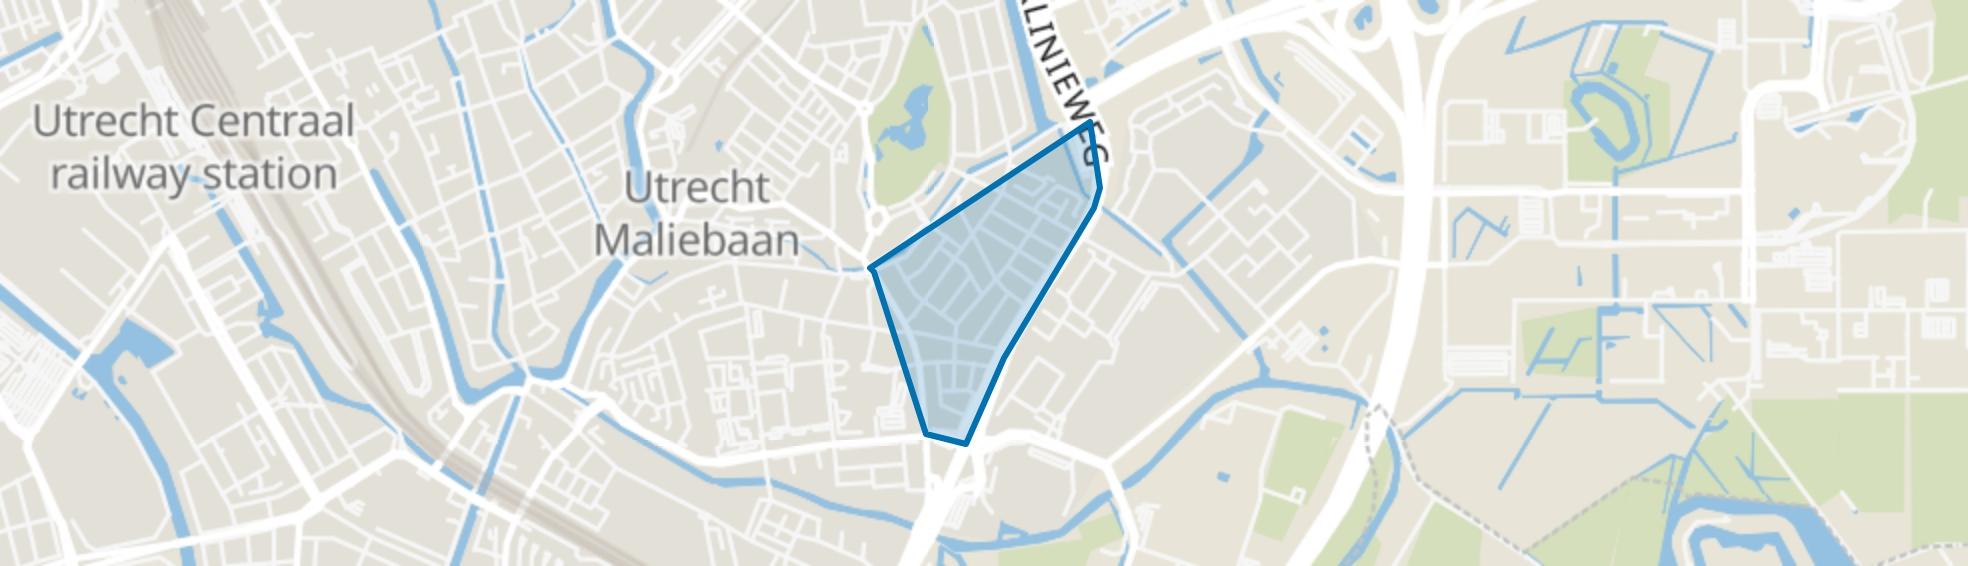 Schildersbuurt, Utrecht map